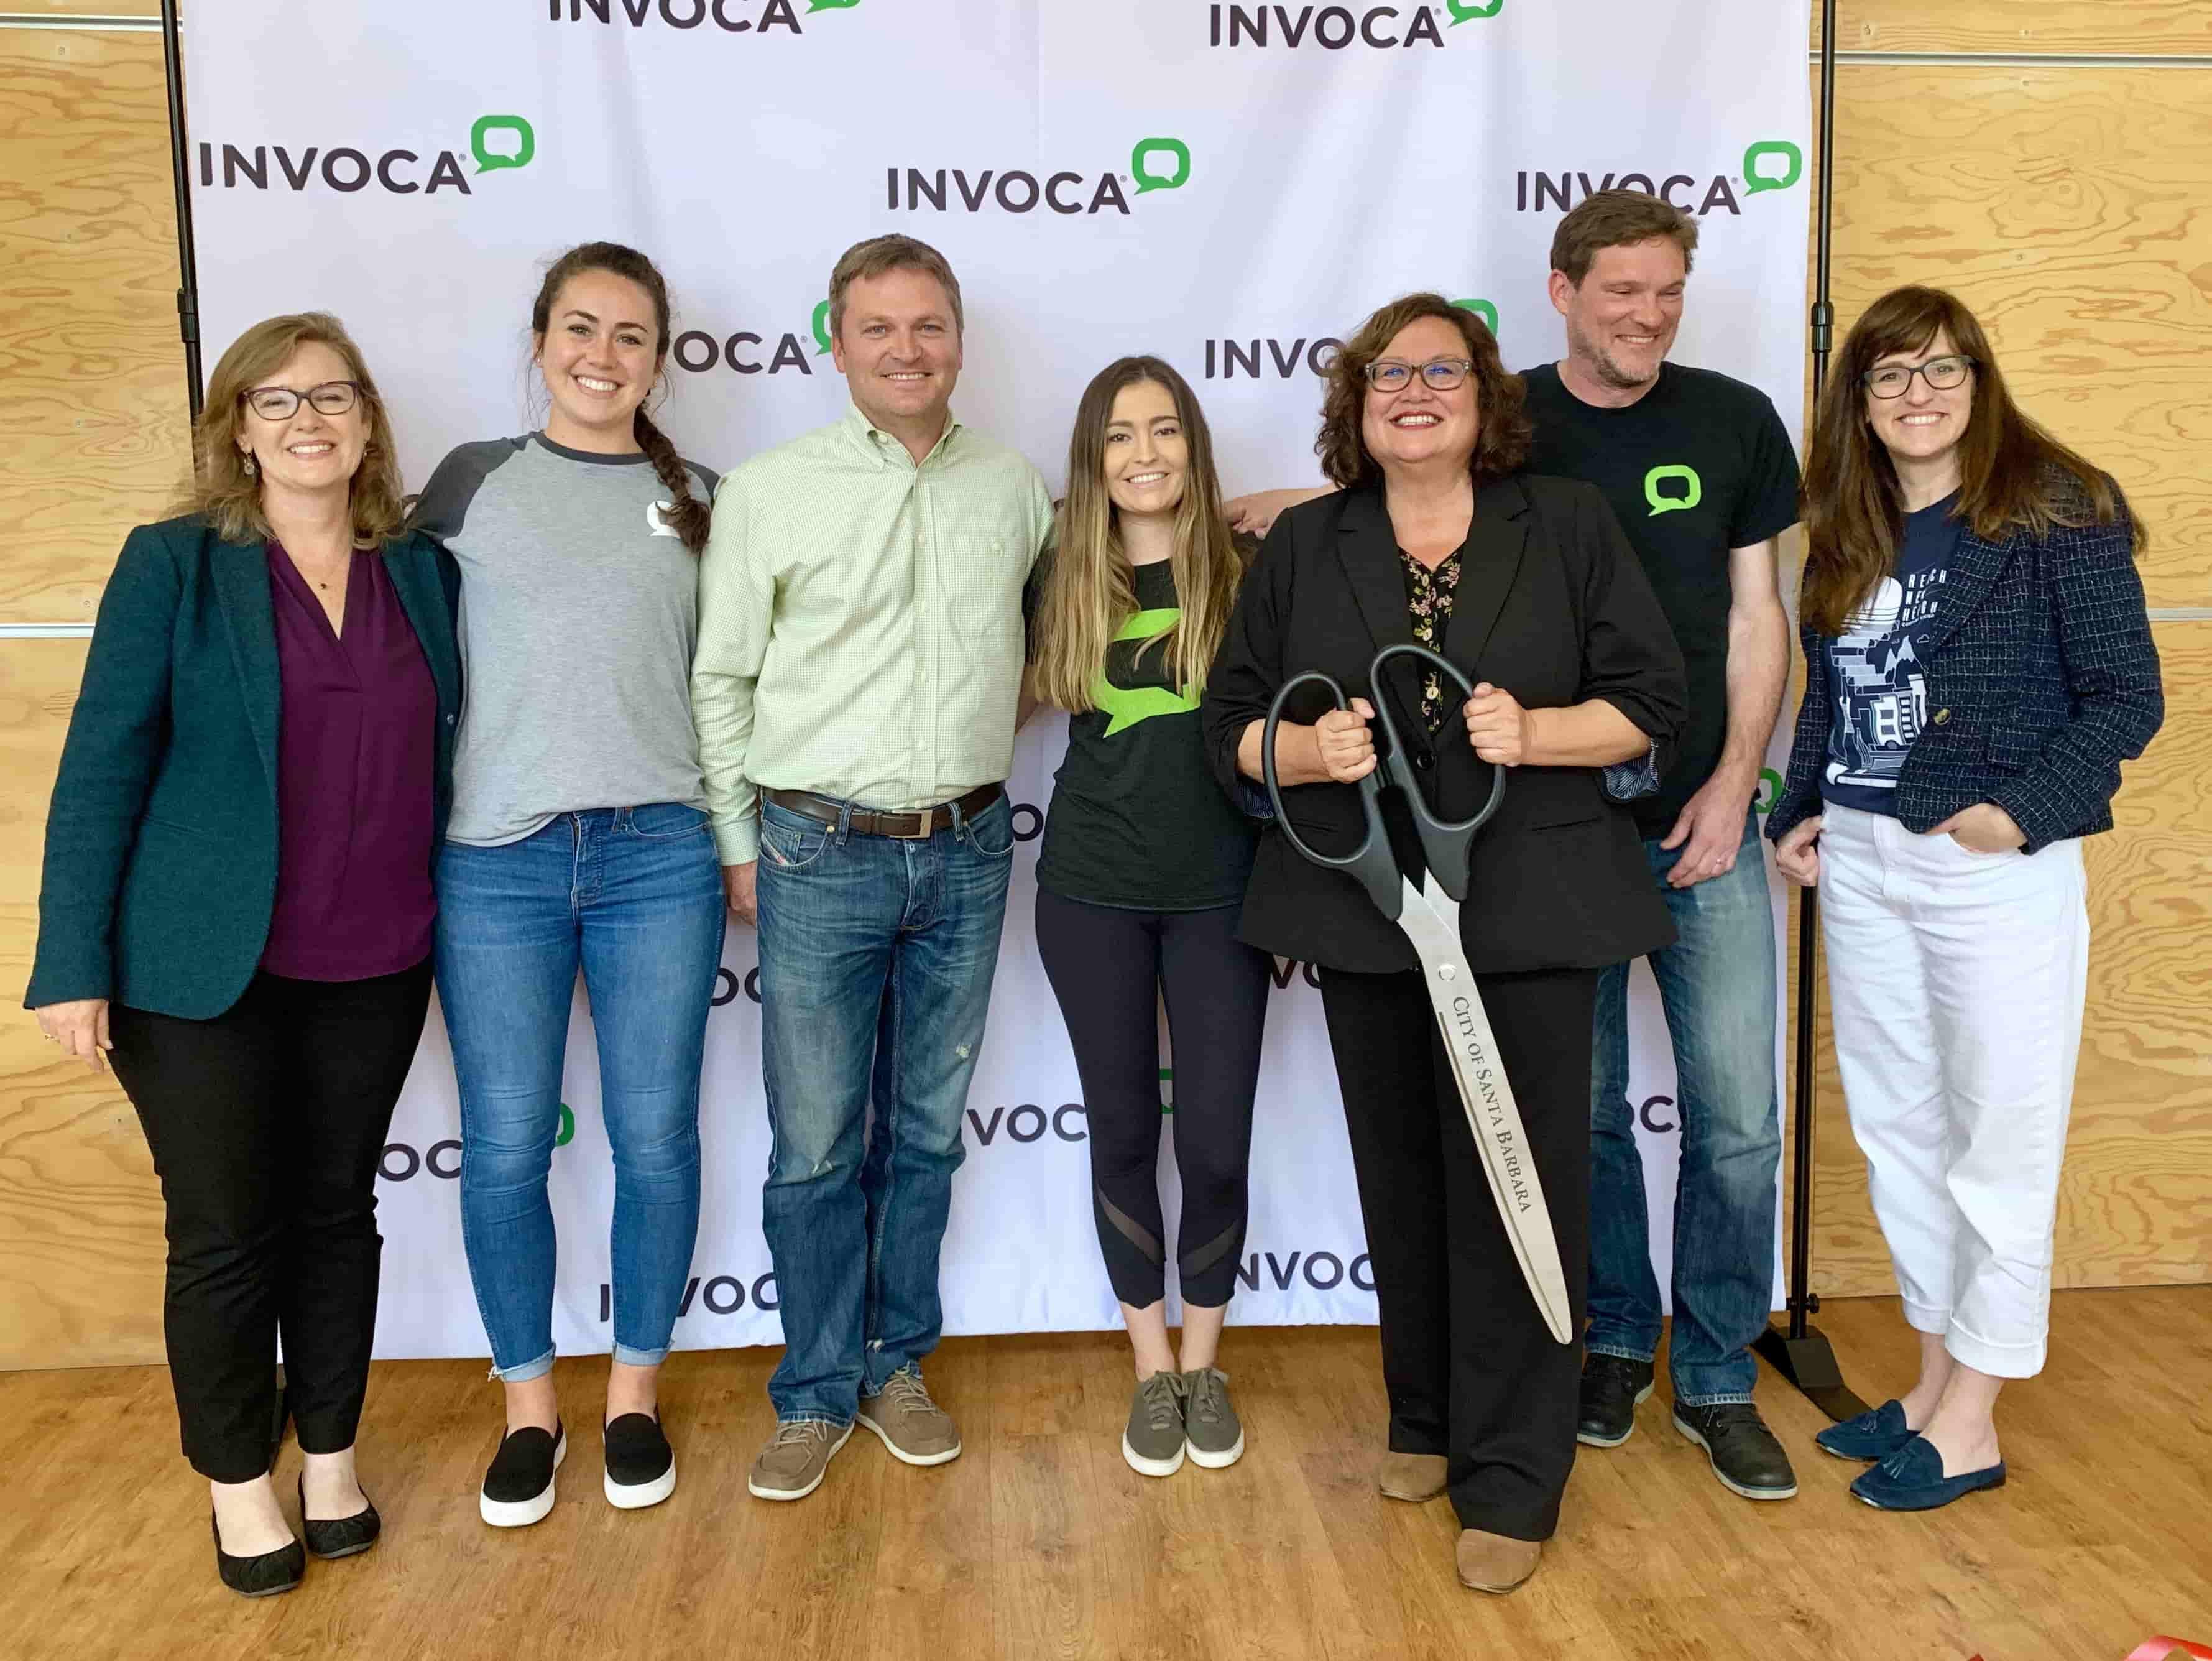 Santa Barbara Mayor Helps Invoca Commemorate its New State Street Headquarters